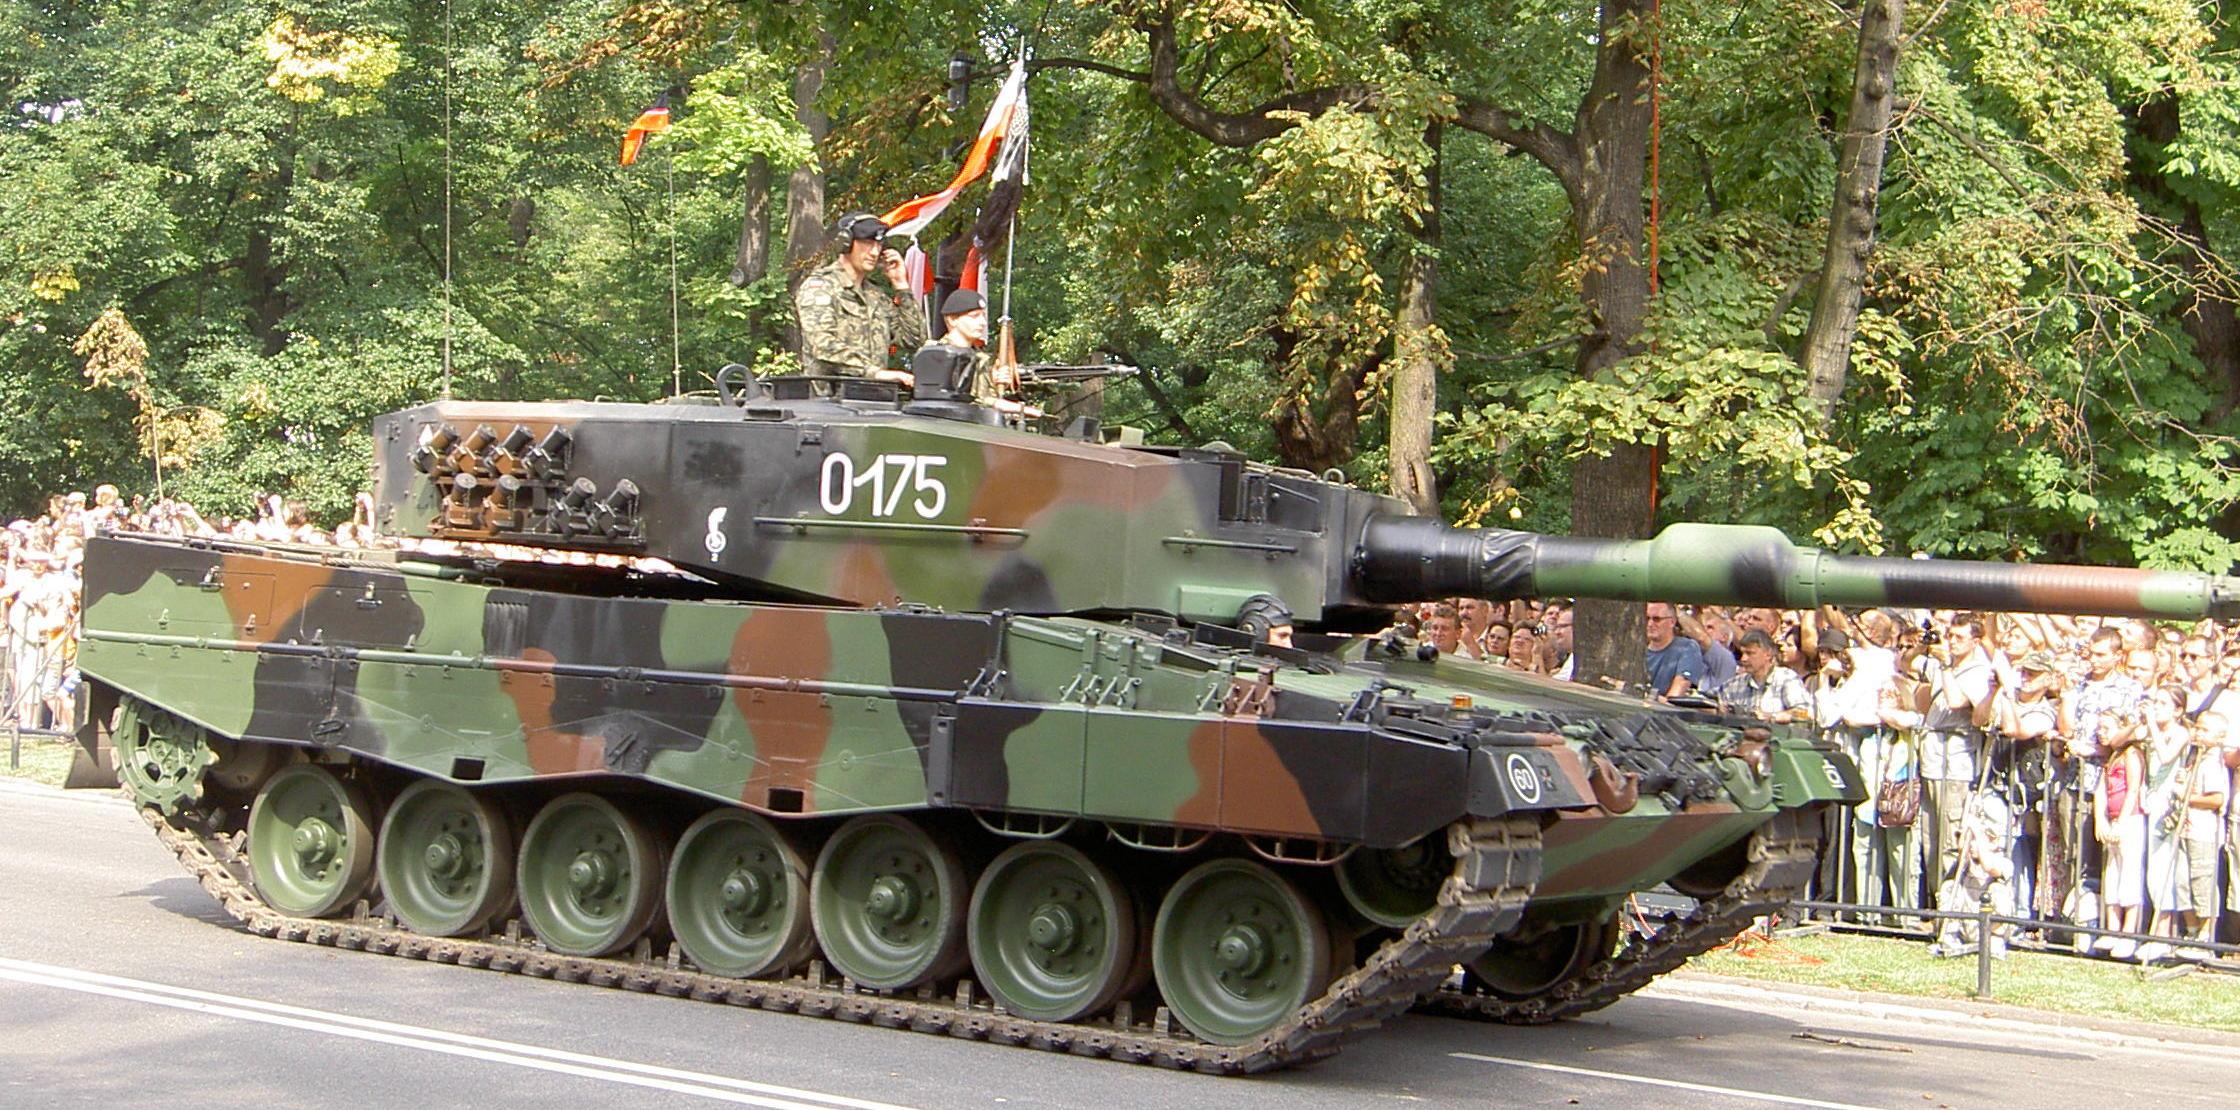 file leopard 2 tank jpg wikipedia. Black Bedroom Furniture Sets. Home Design Ideas